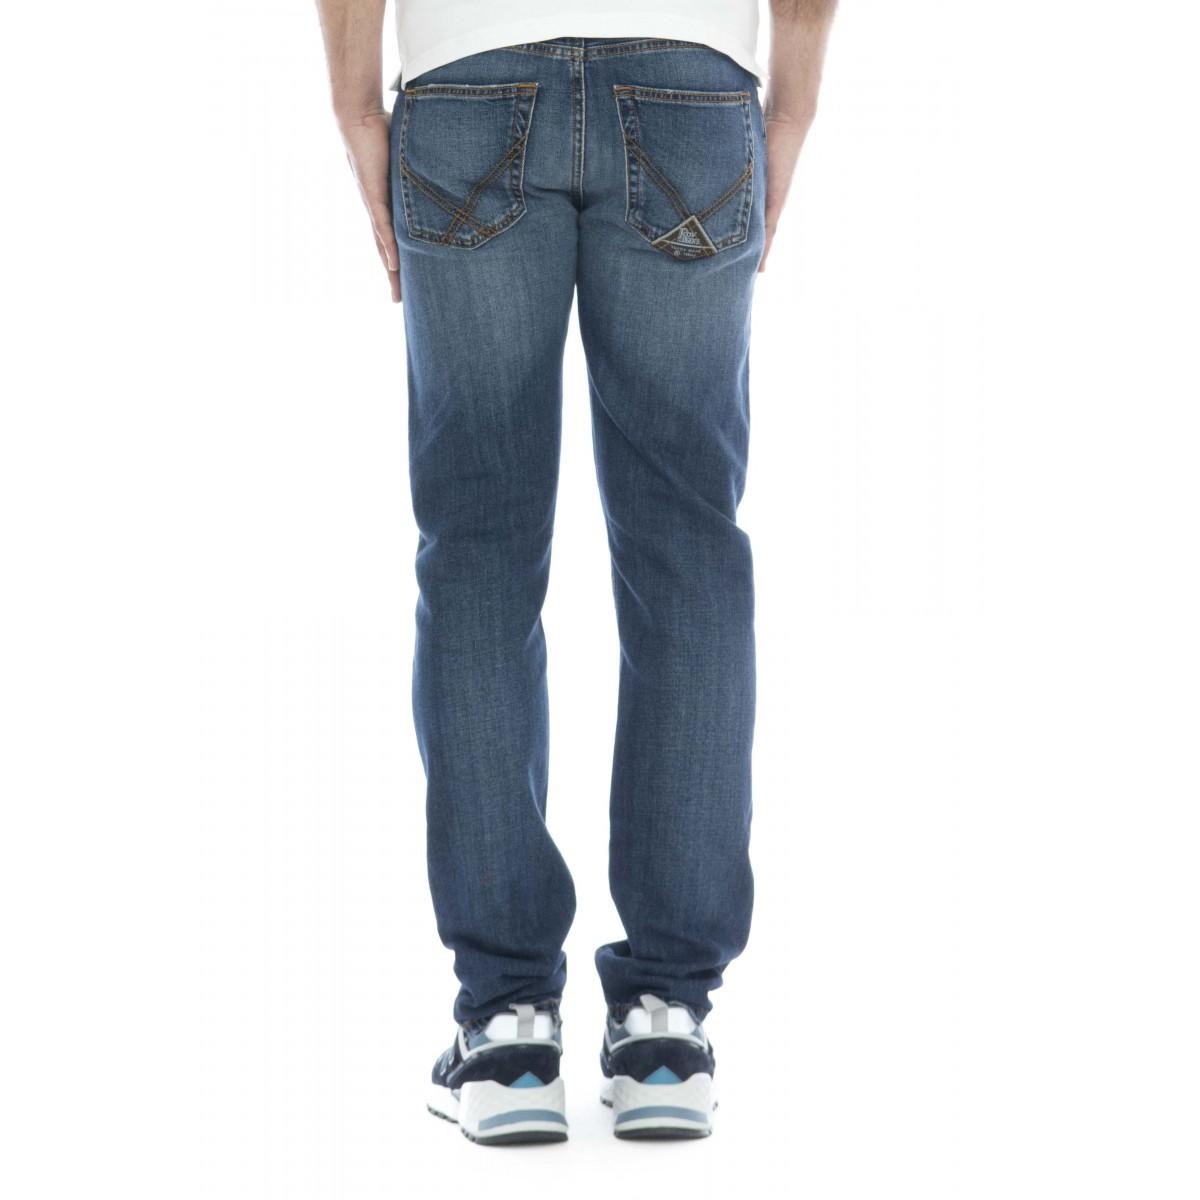 Jeans - 529 noforlong